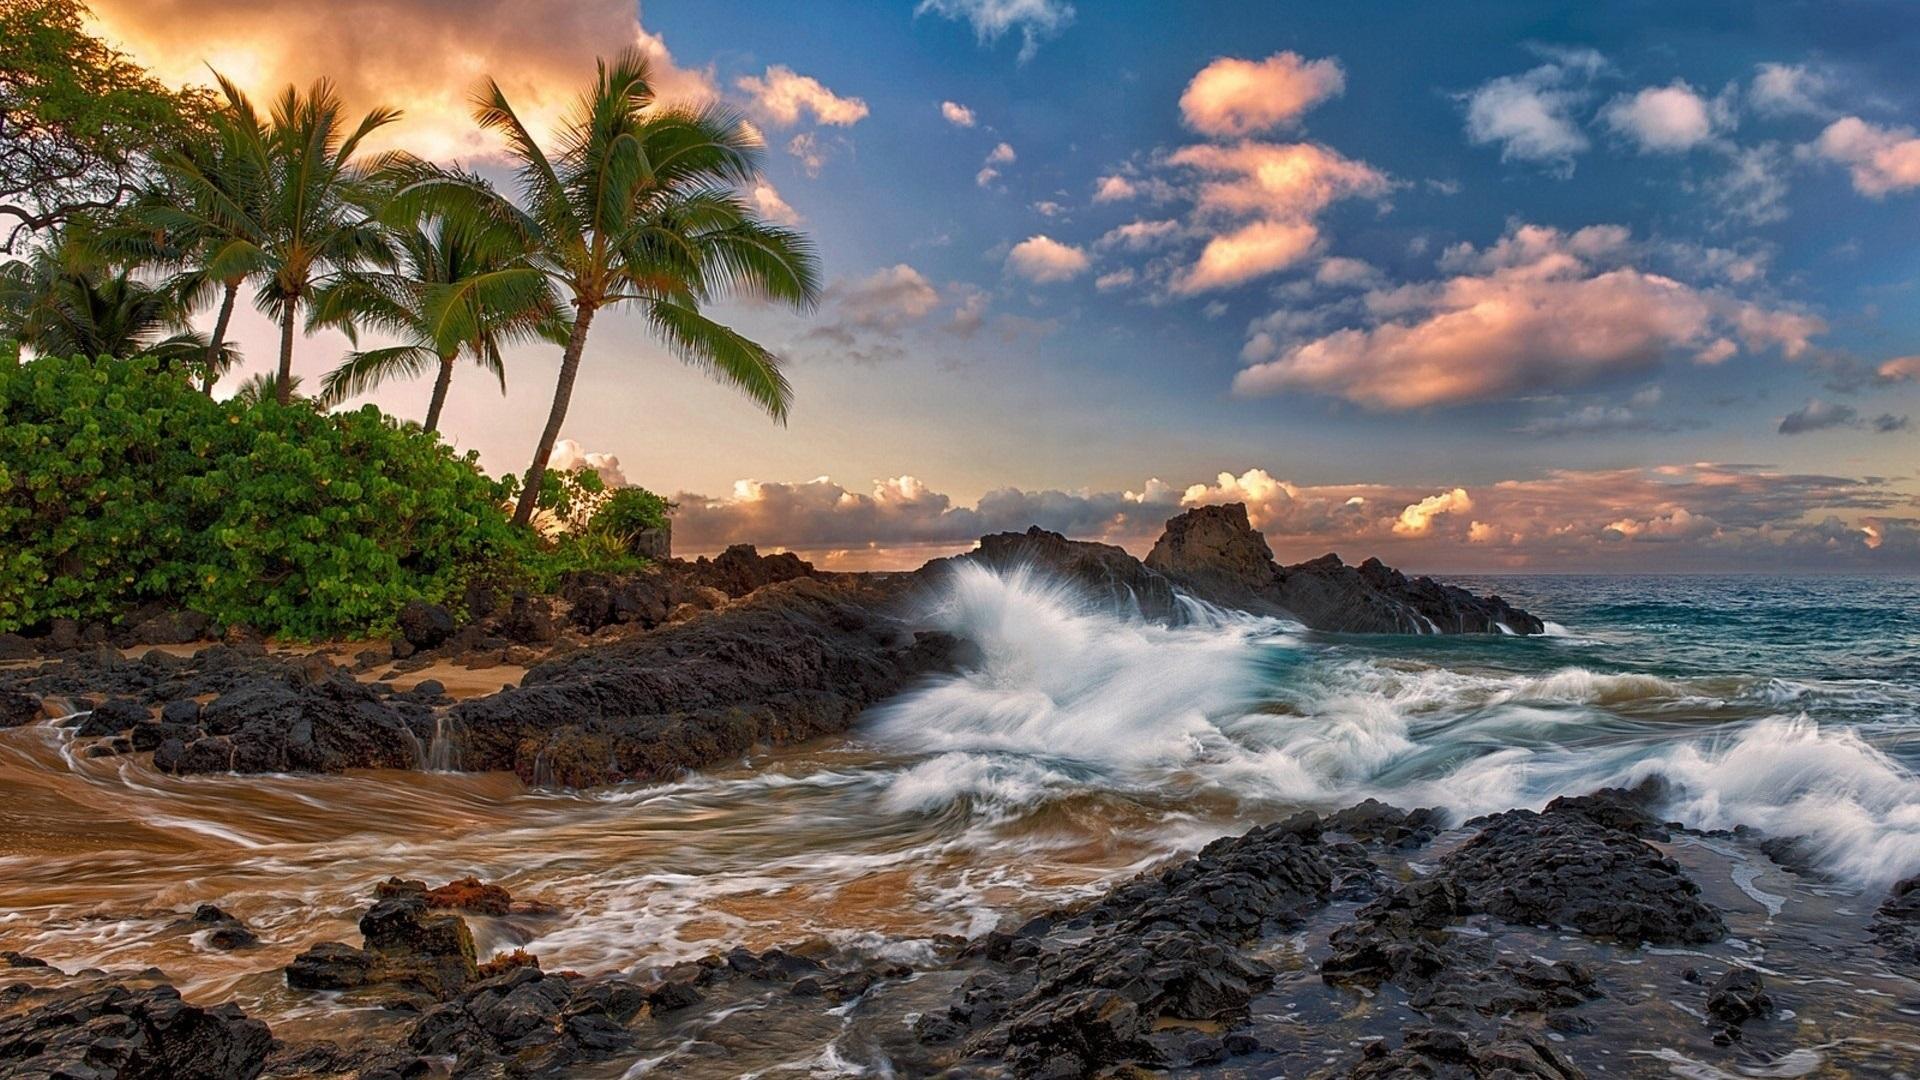 Wallpaper Maui Hawaii Quiet Ocean Rocks Palm Trees